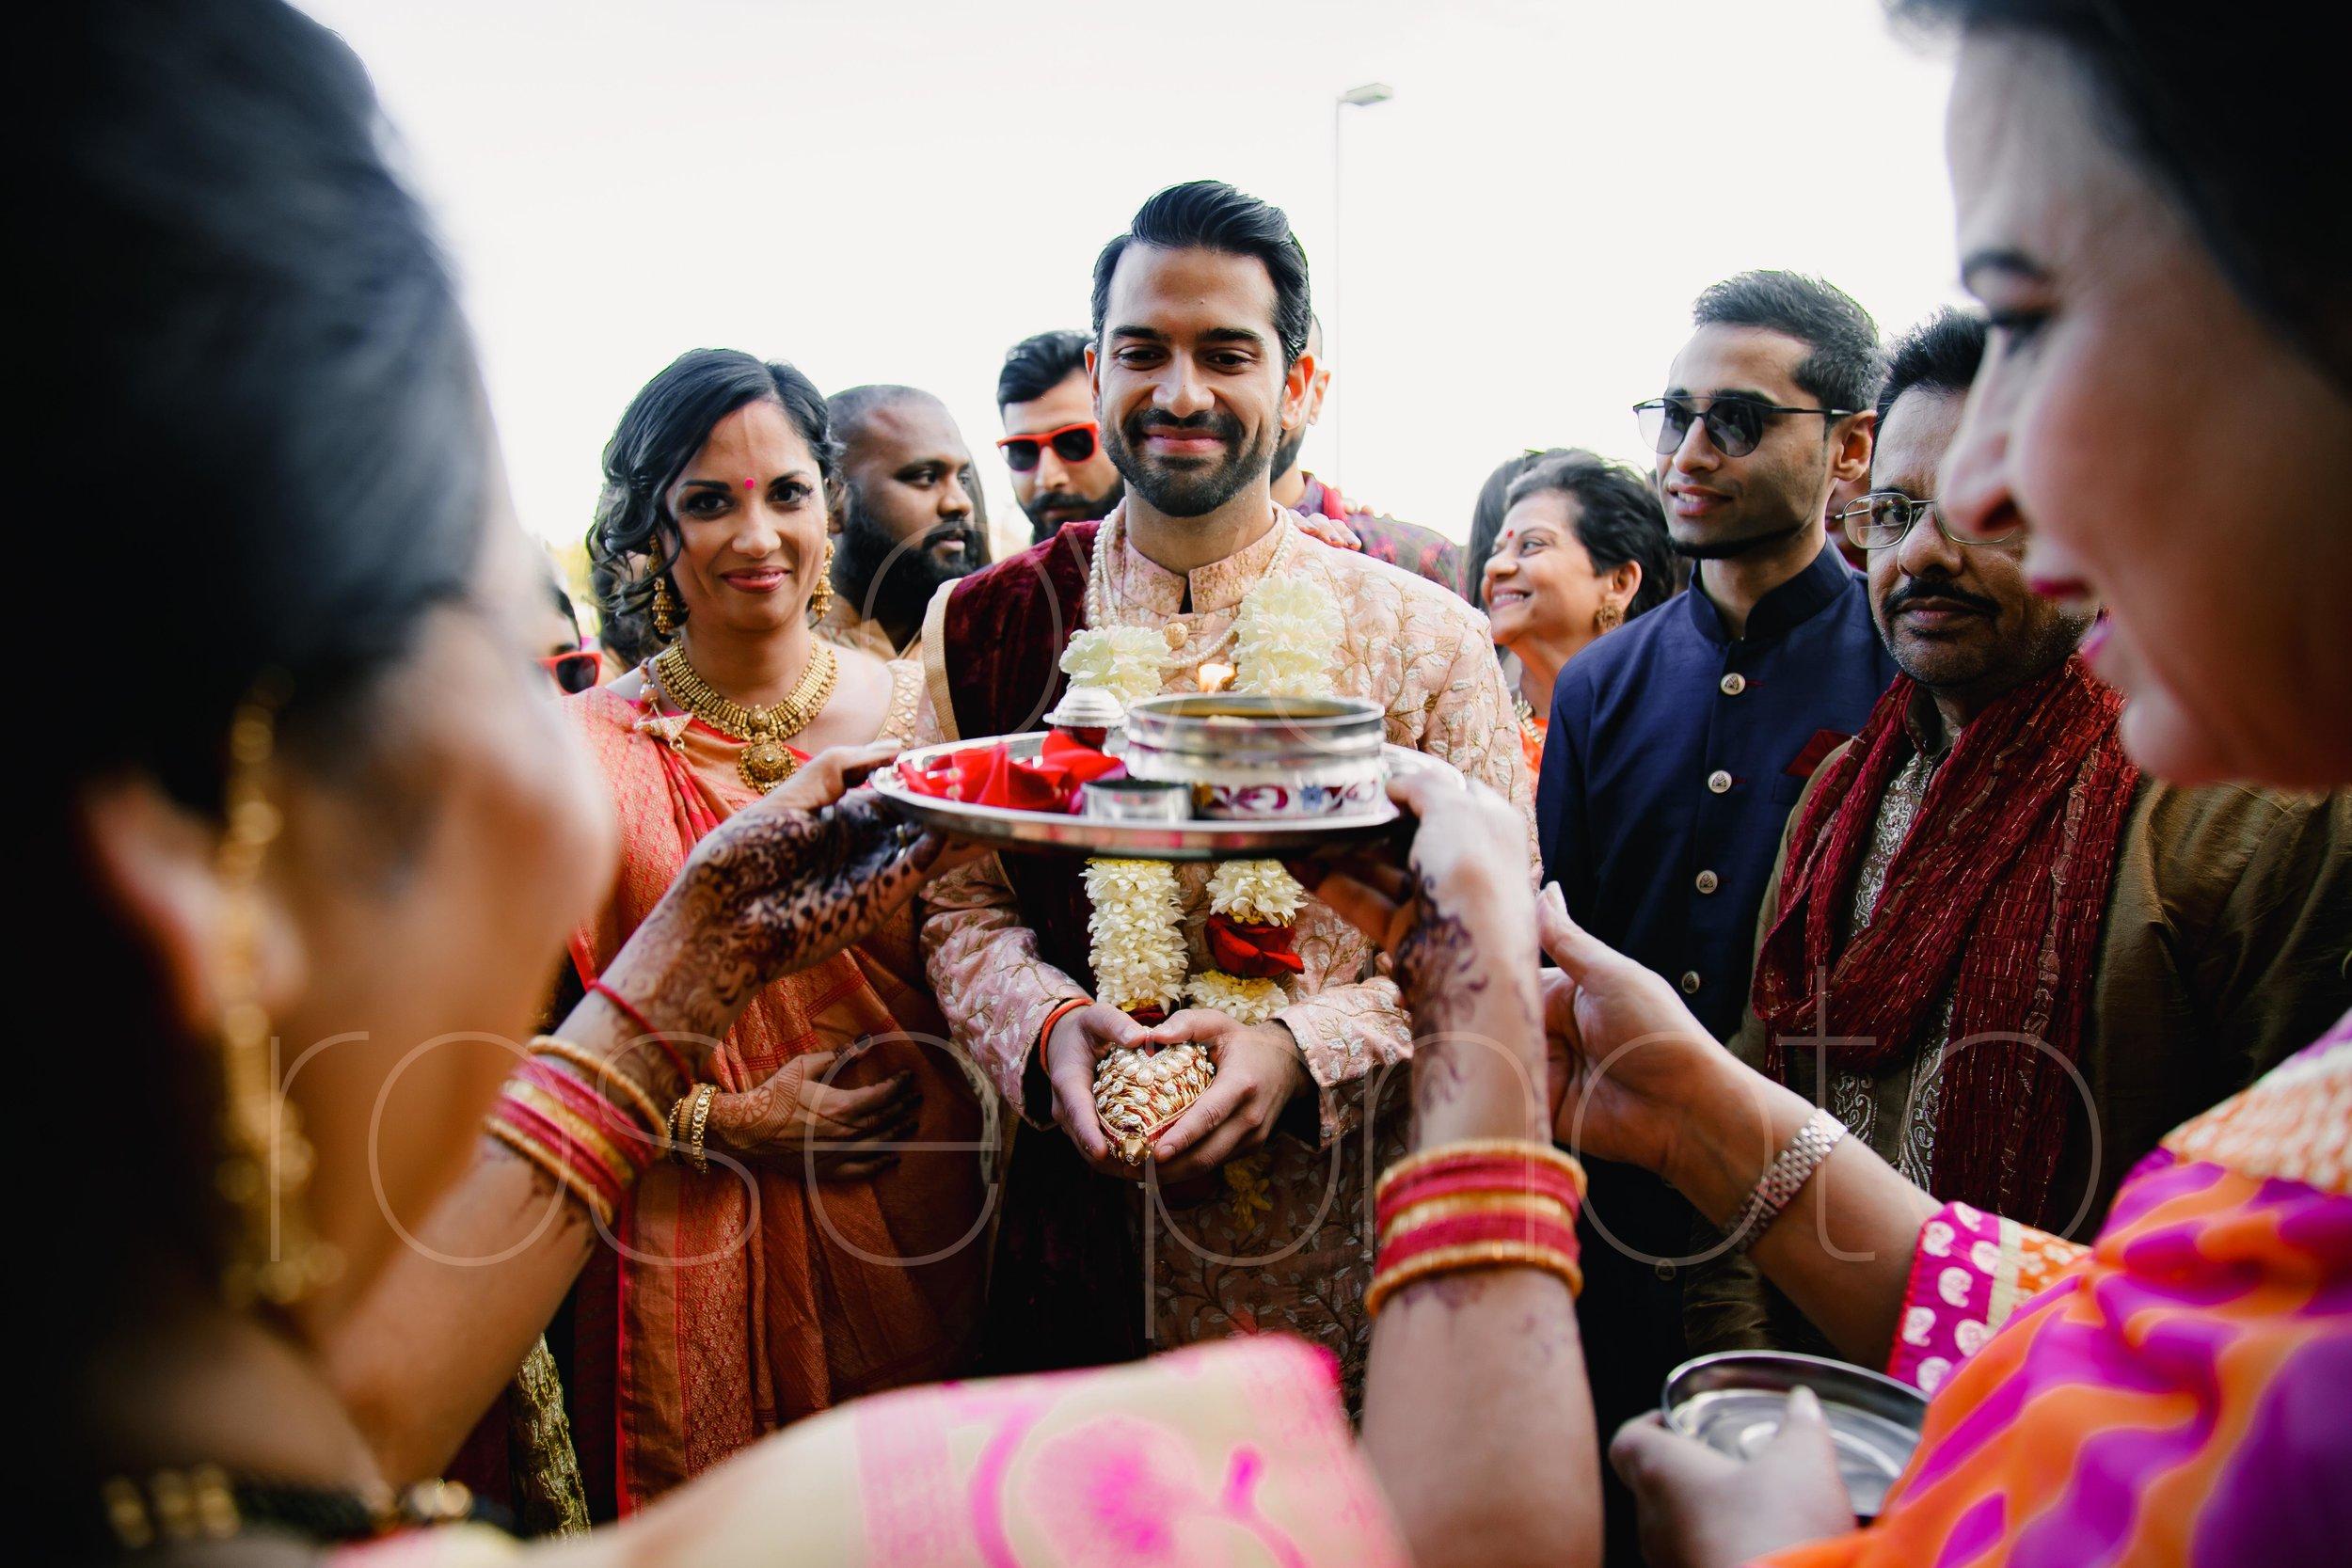 Chicago Indian Wedding best photography lifestyle wedding portrait luxury wedding-26.jpg